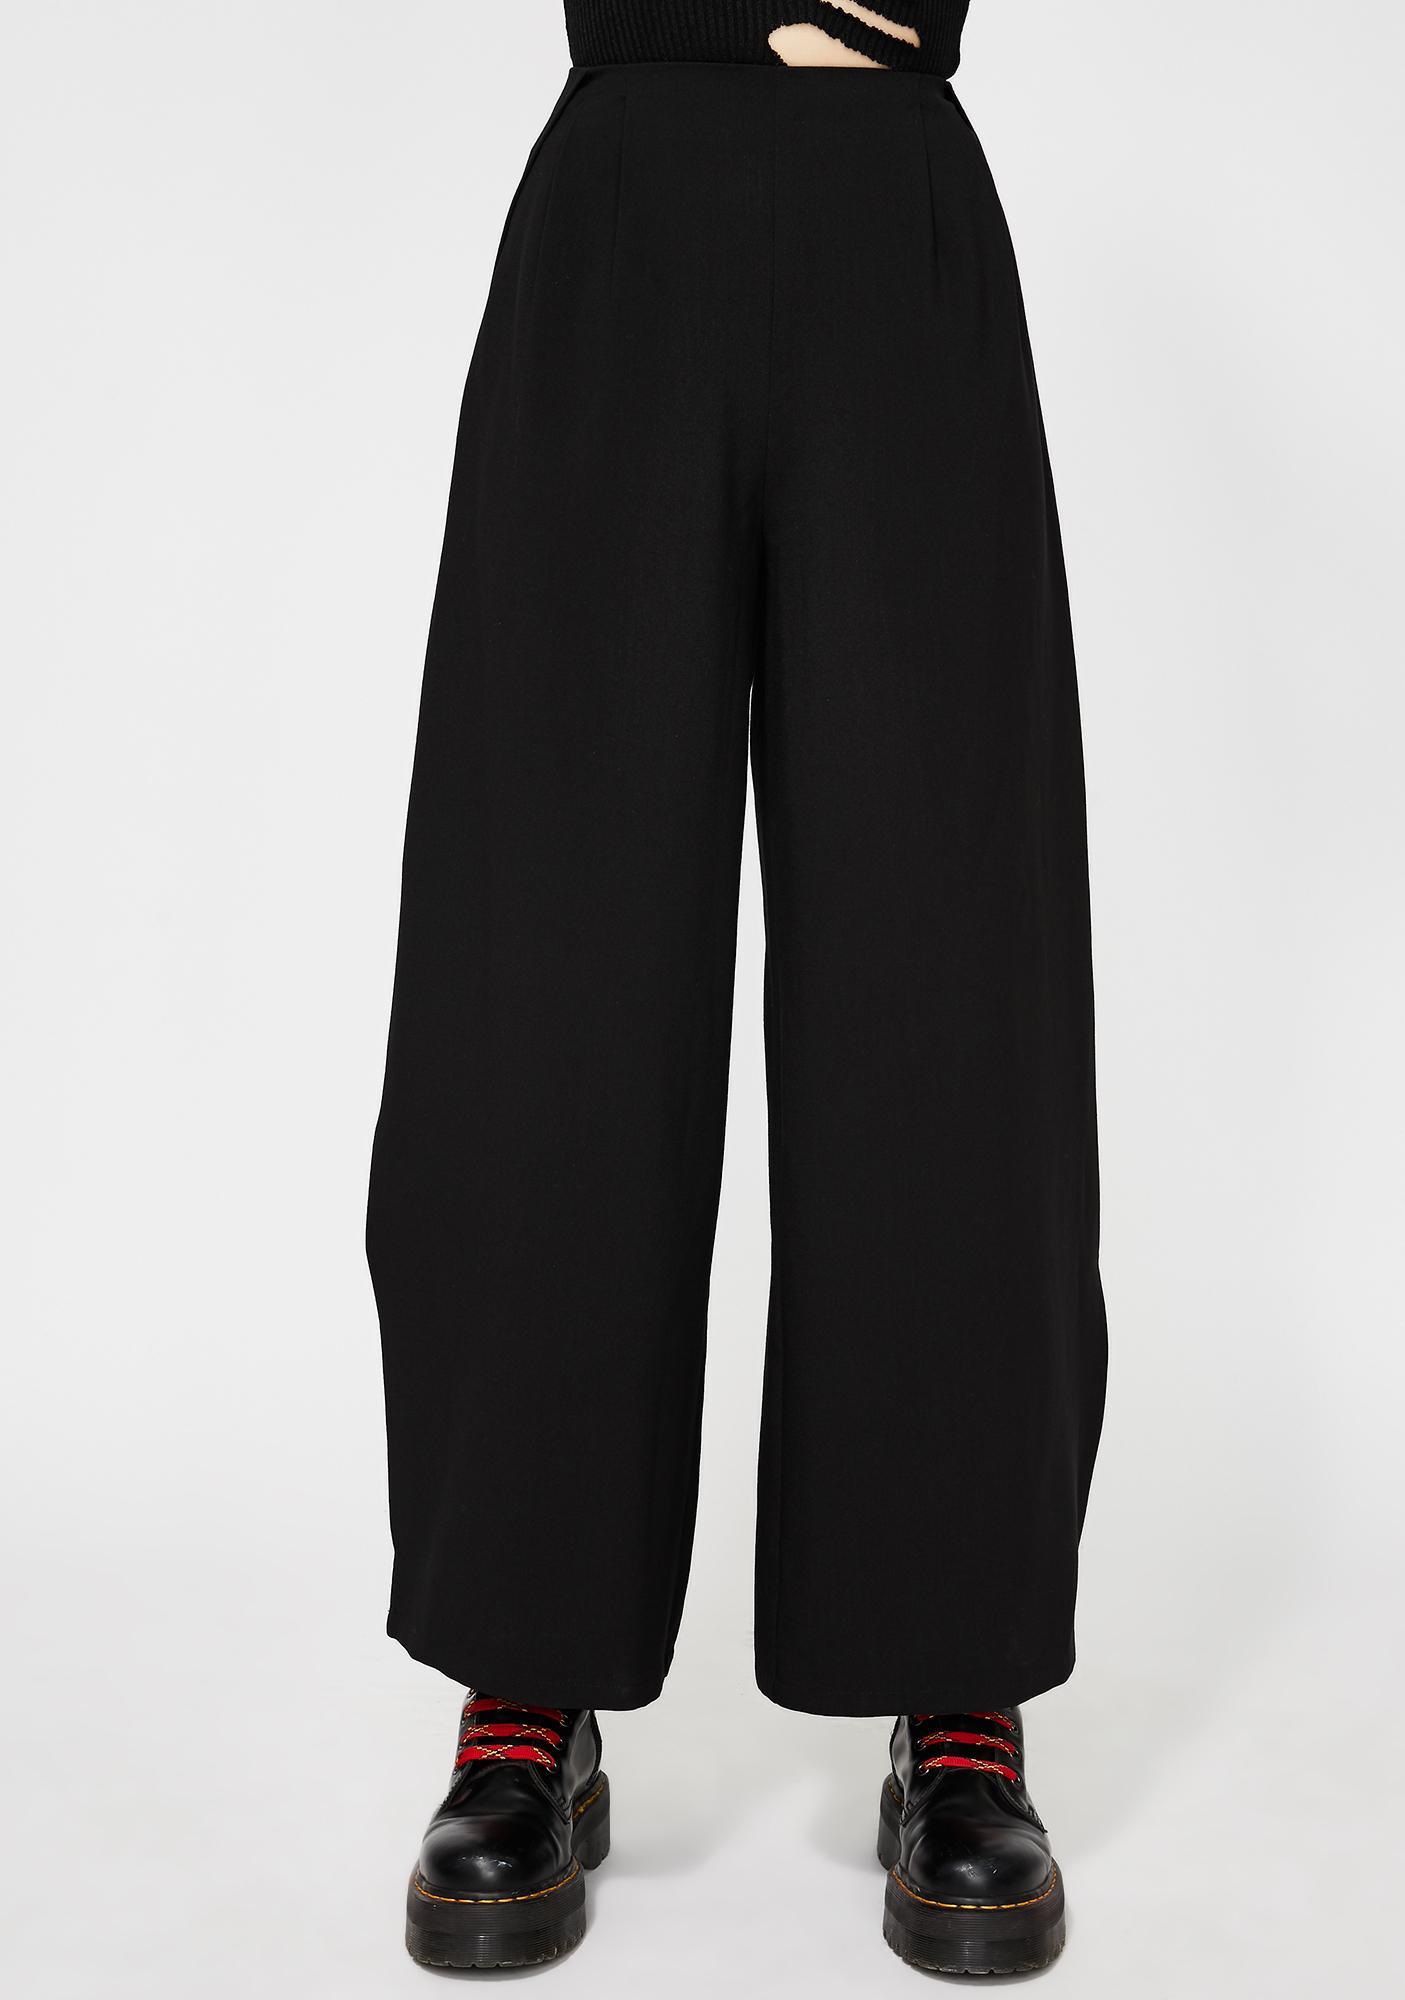 Twiin Zenith Wide Leg Pants